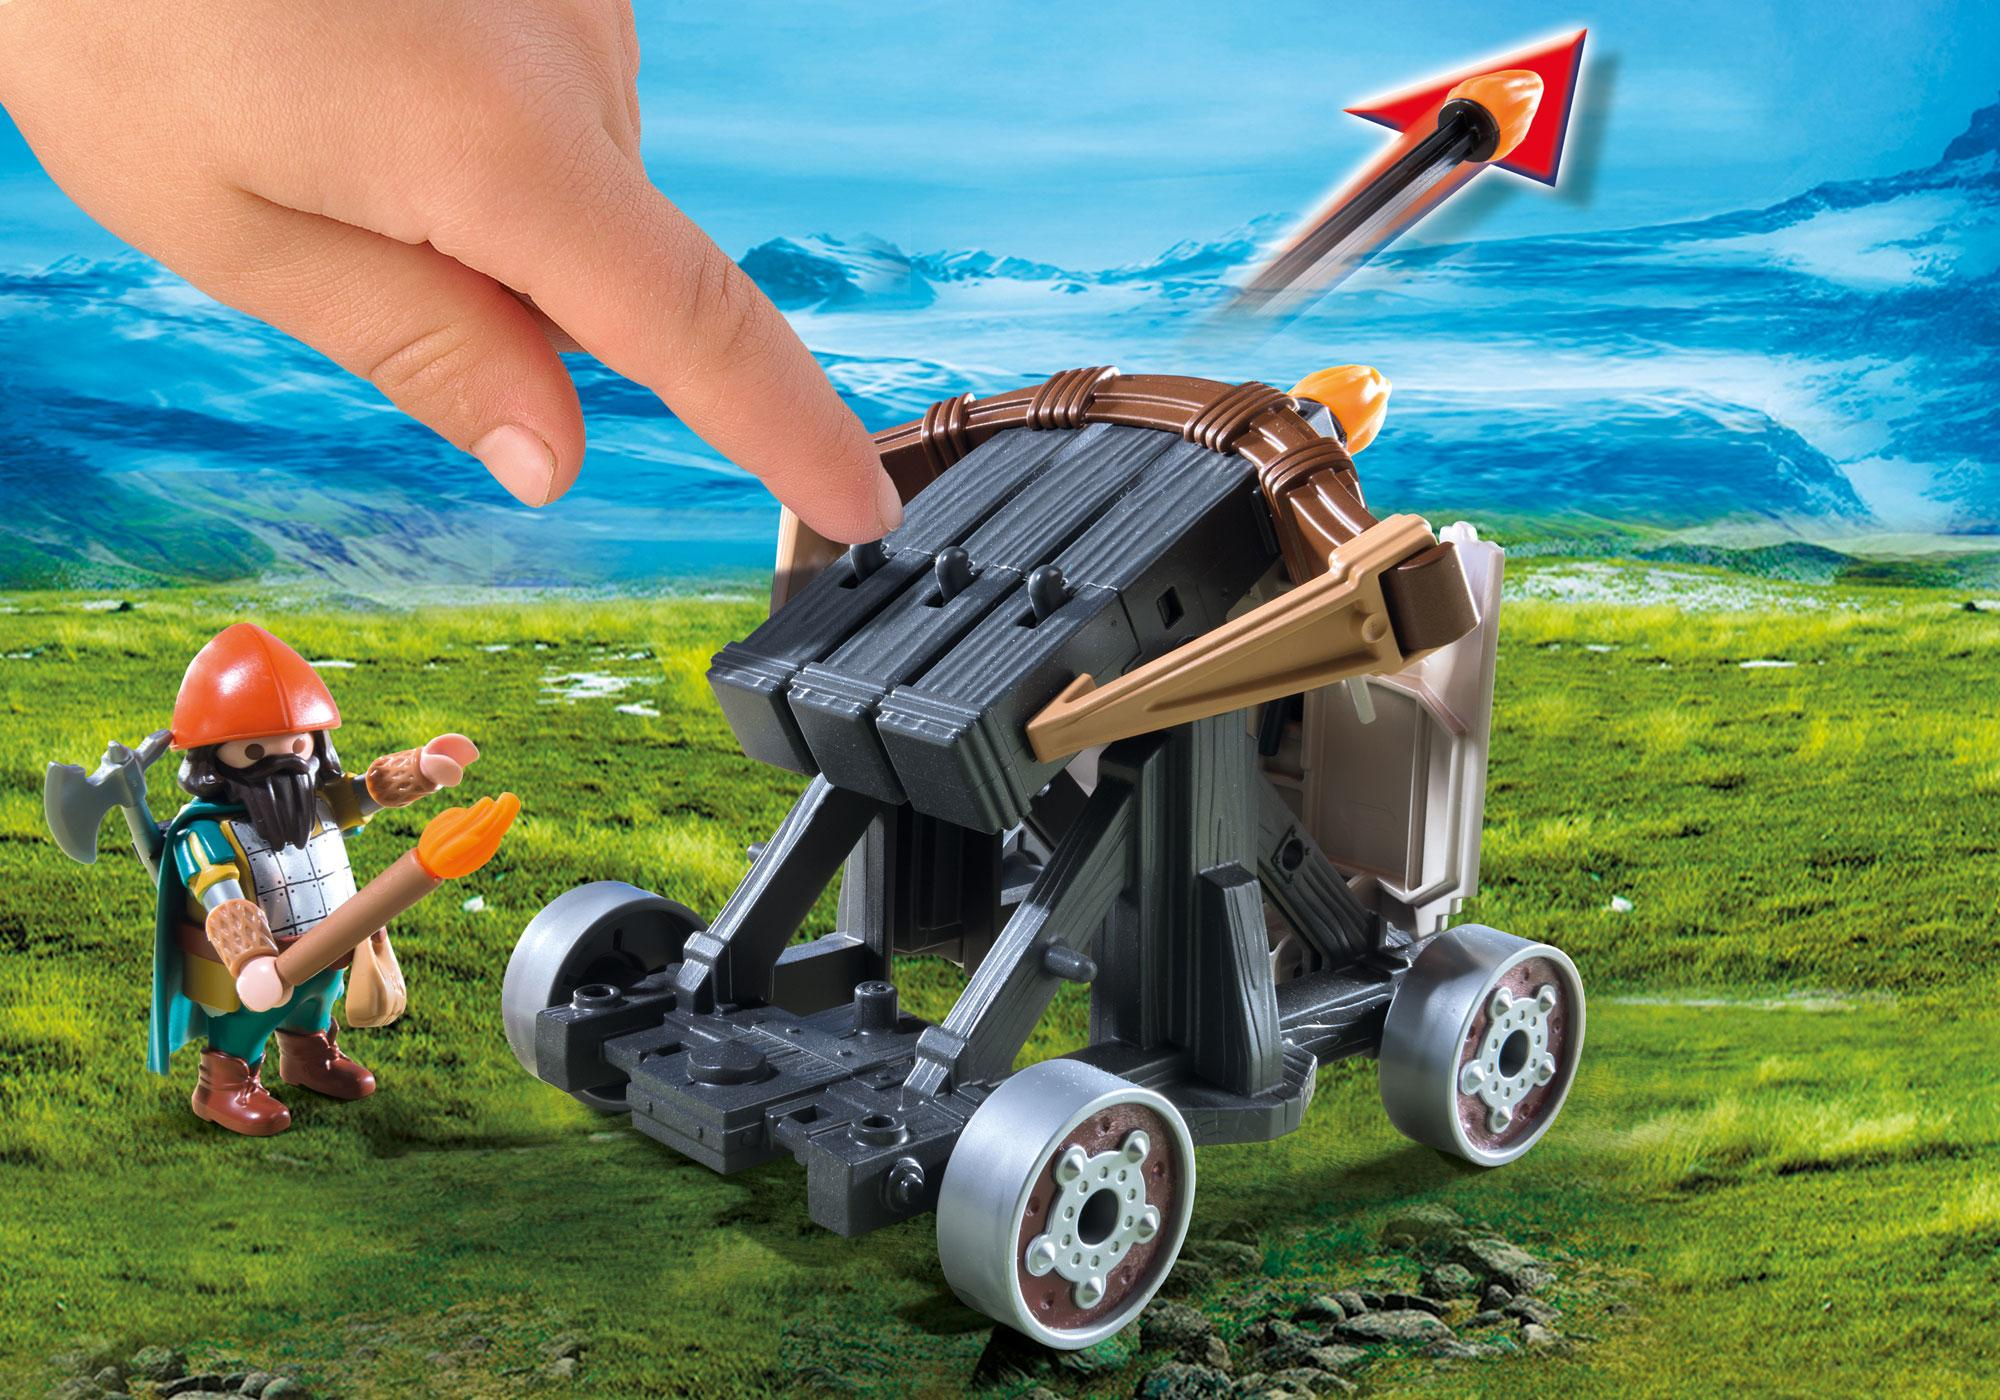 http://media.playmobil.com/i/playmobil/9341_product_extra2/Ponyforspand med dværgeballist